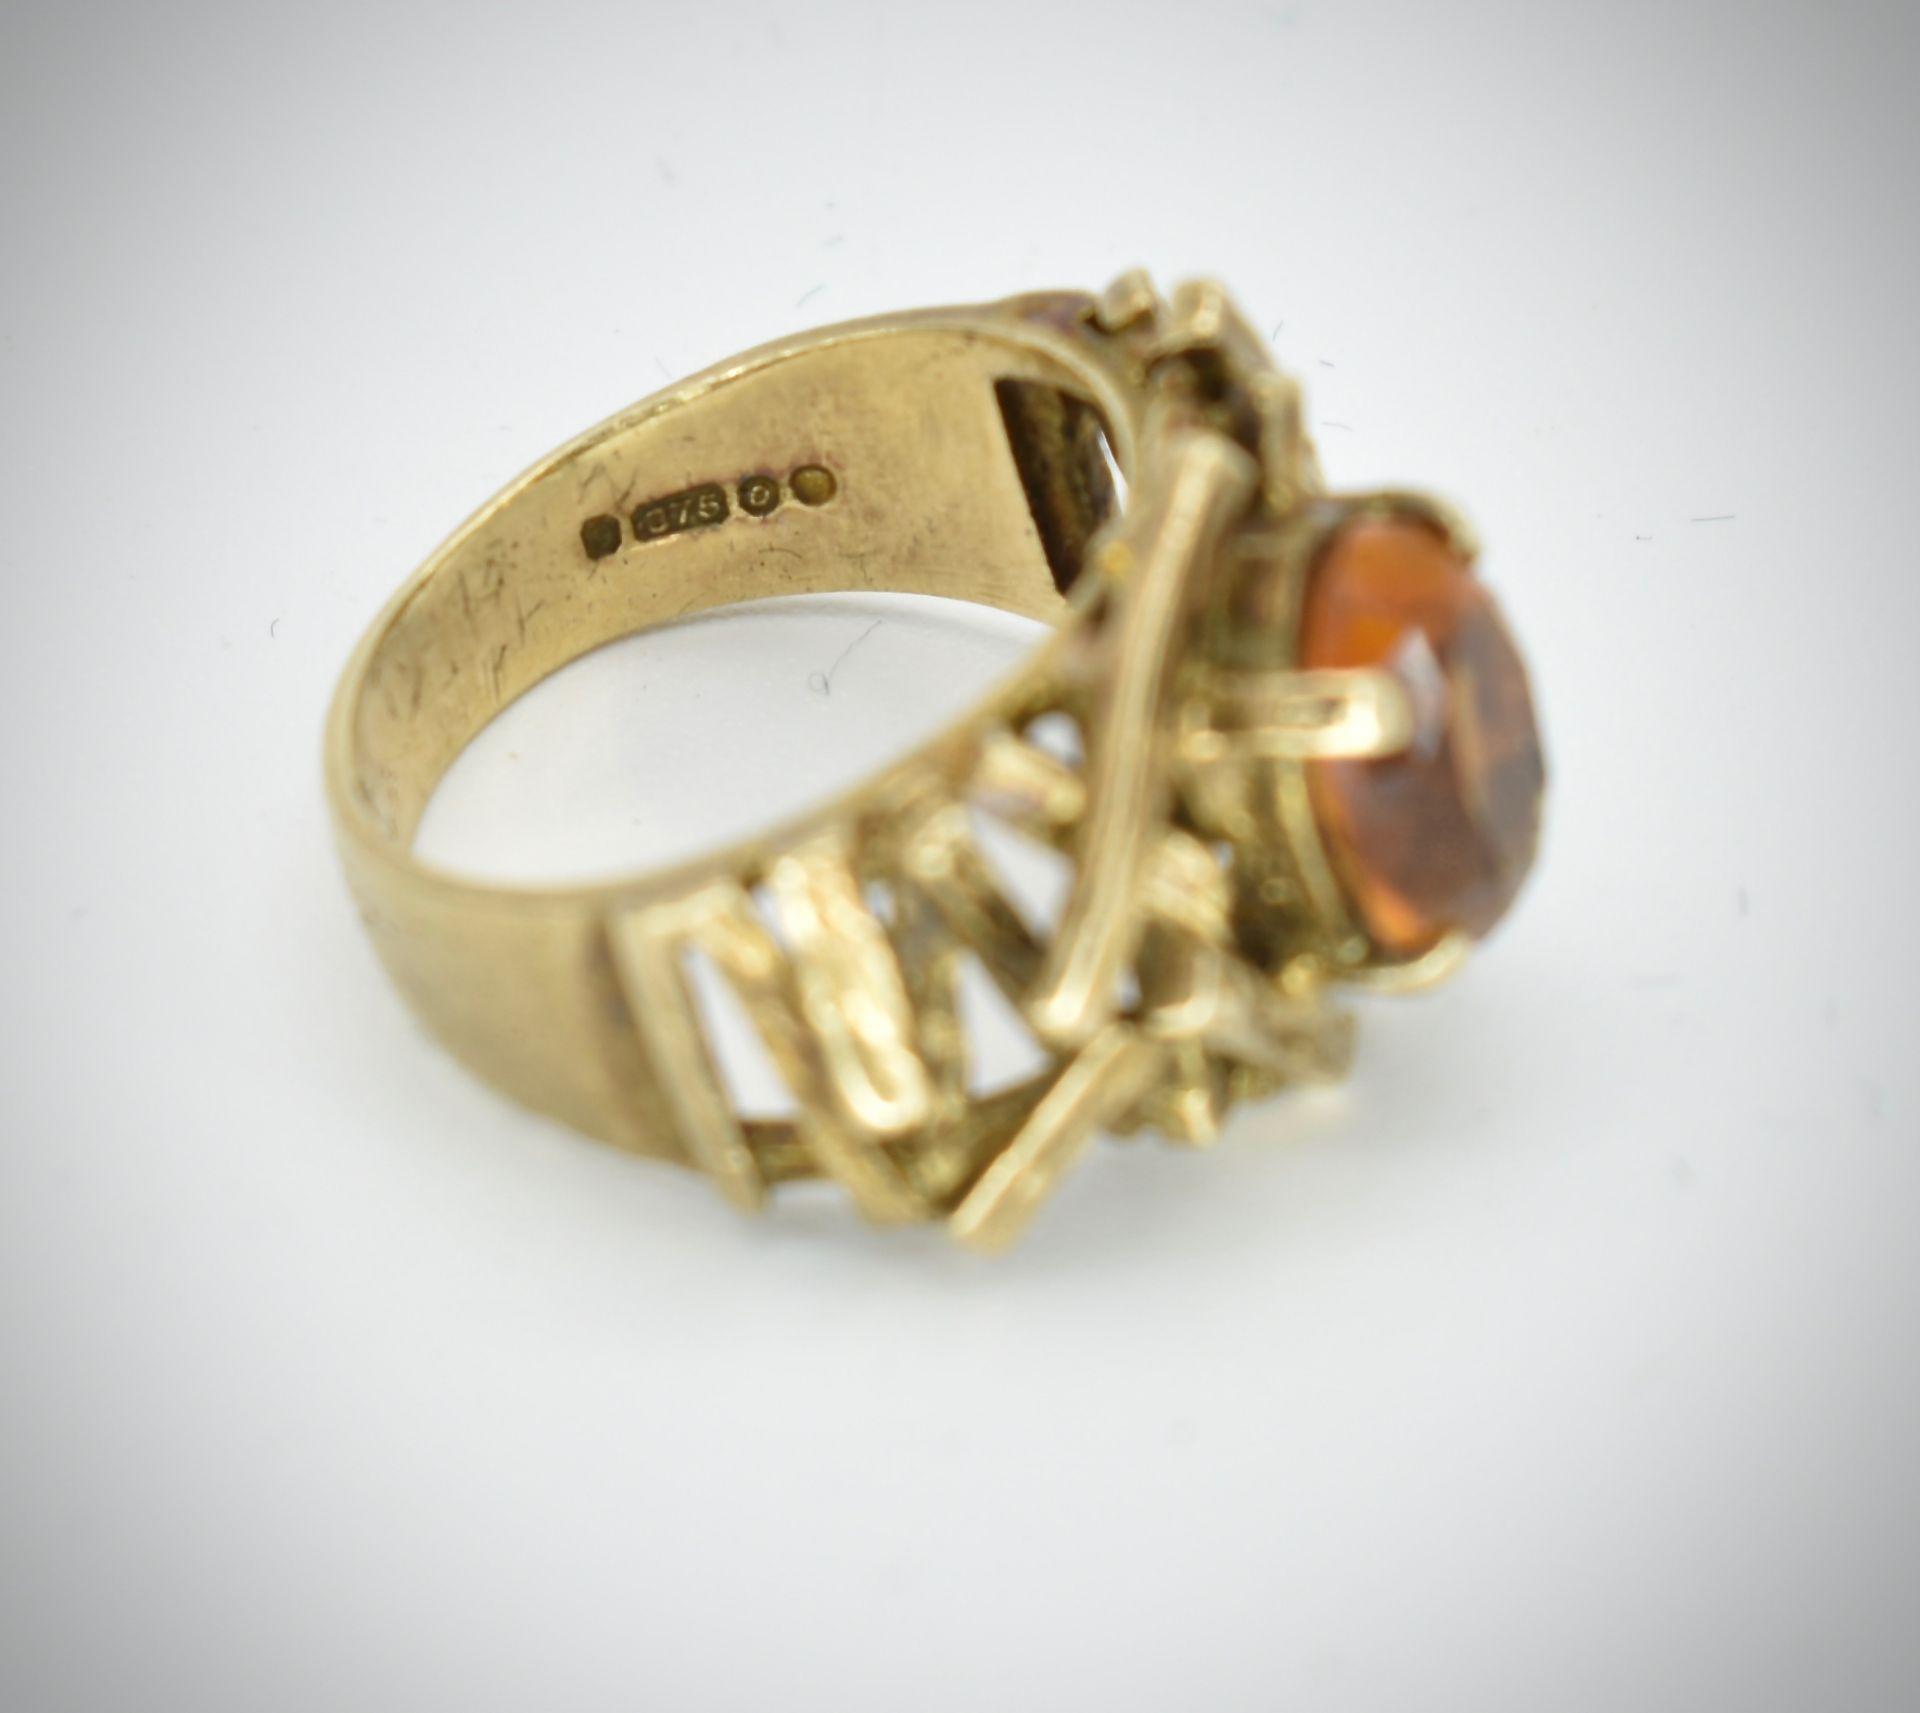 9ct Gold & Citrine Hallmarked 1960's Designer Ring - - Image 3 of 6